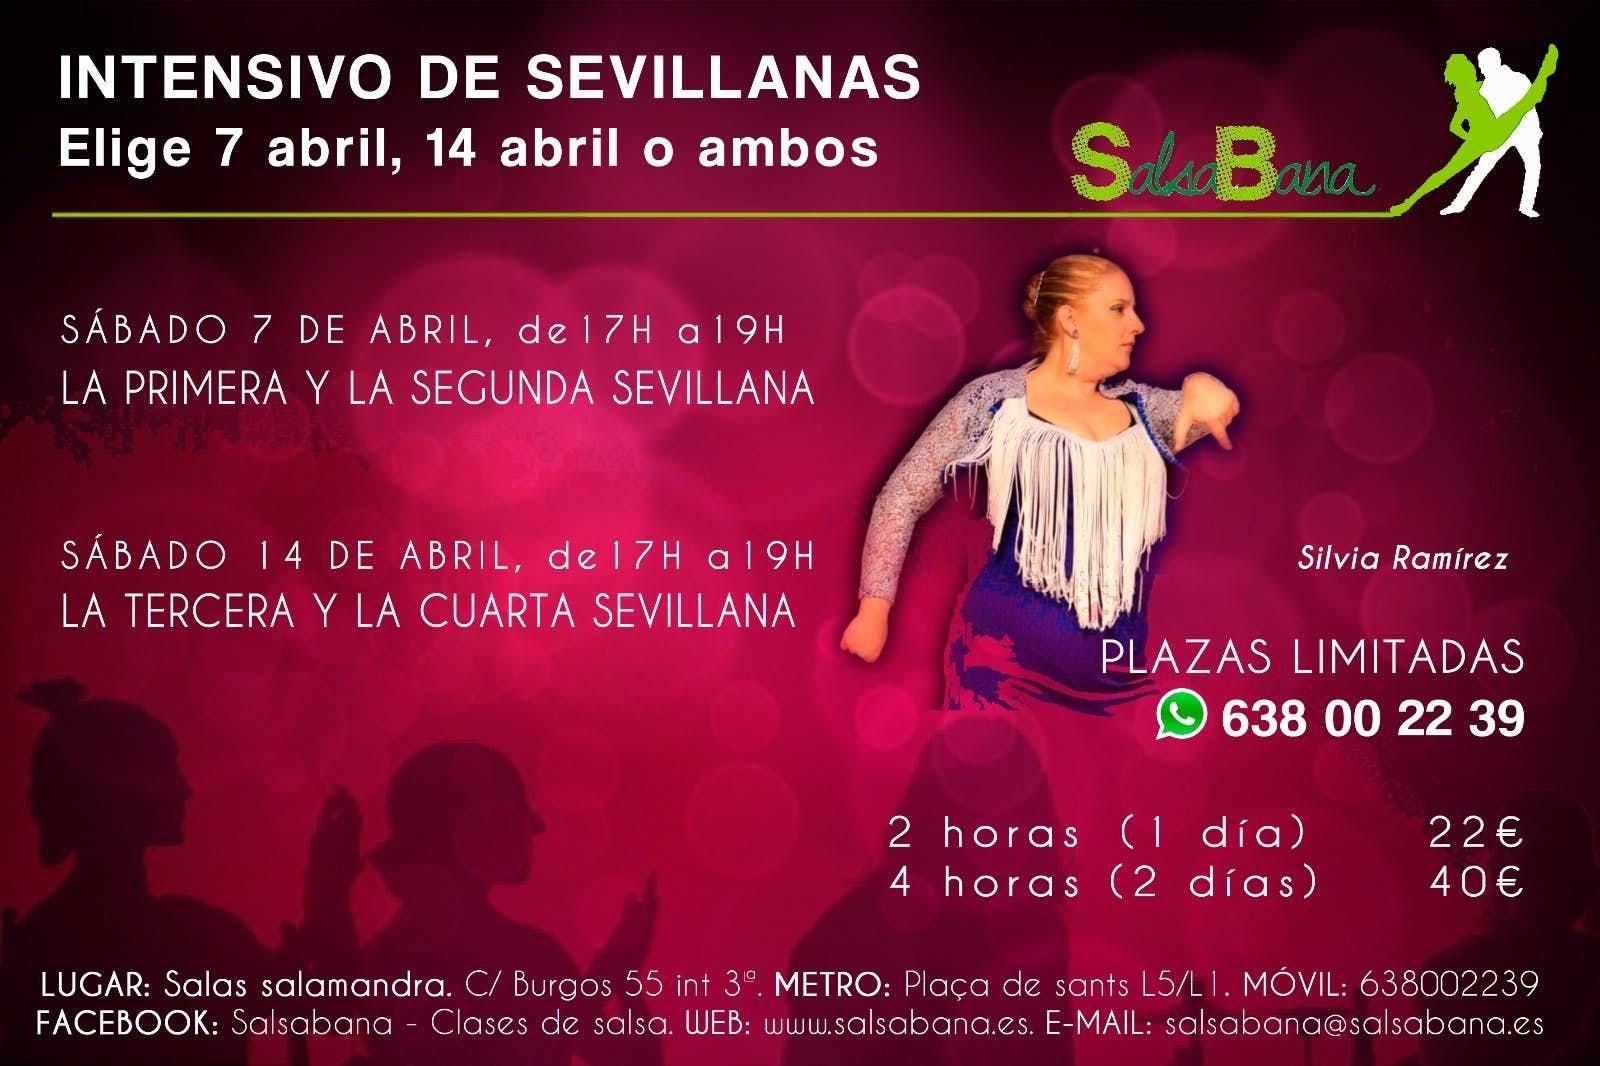 Intensivo de SEVILLANAS en Barcelona - Sábado 7 de abril ...